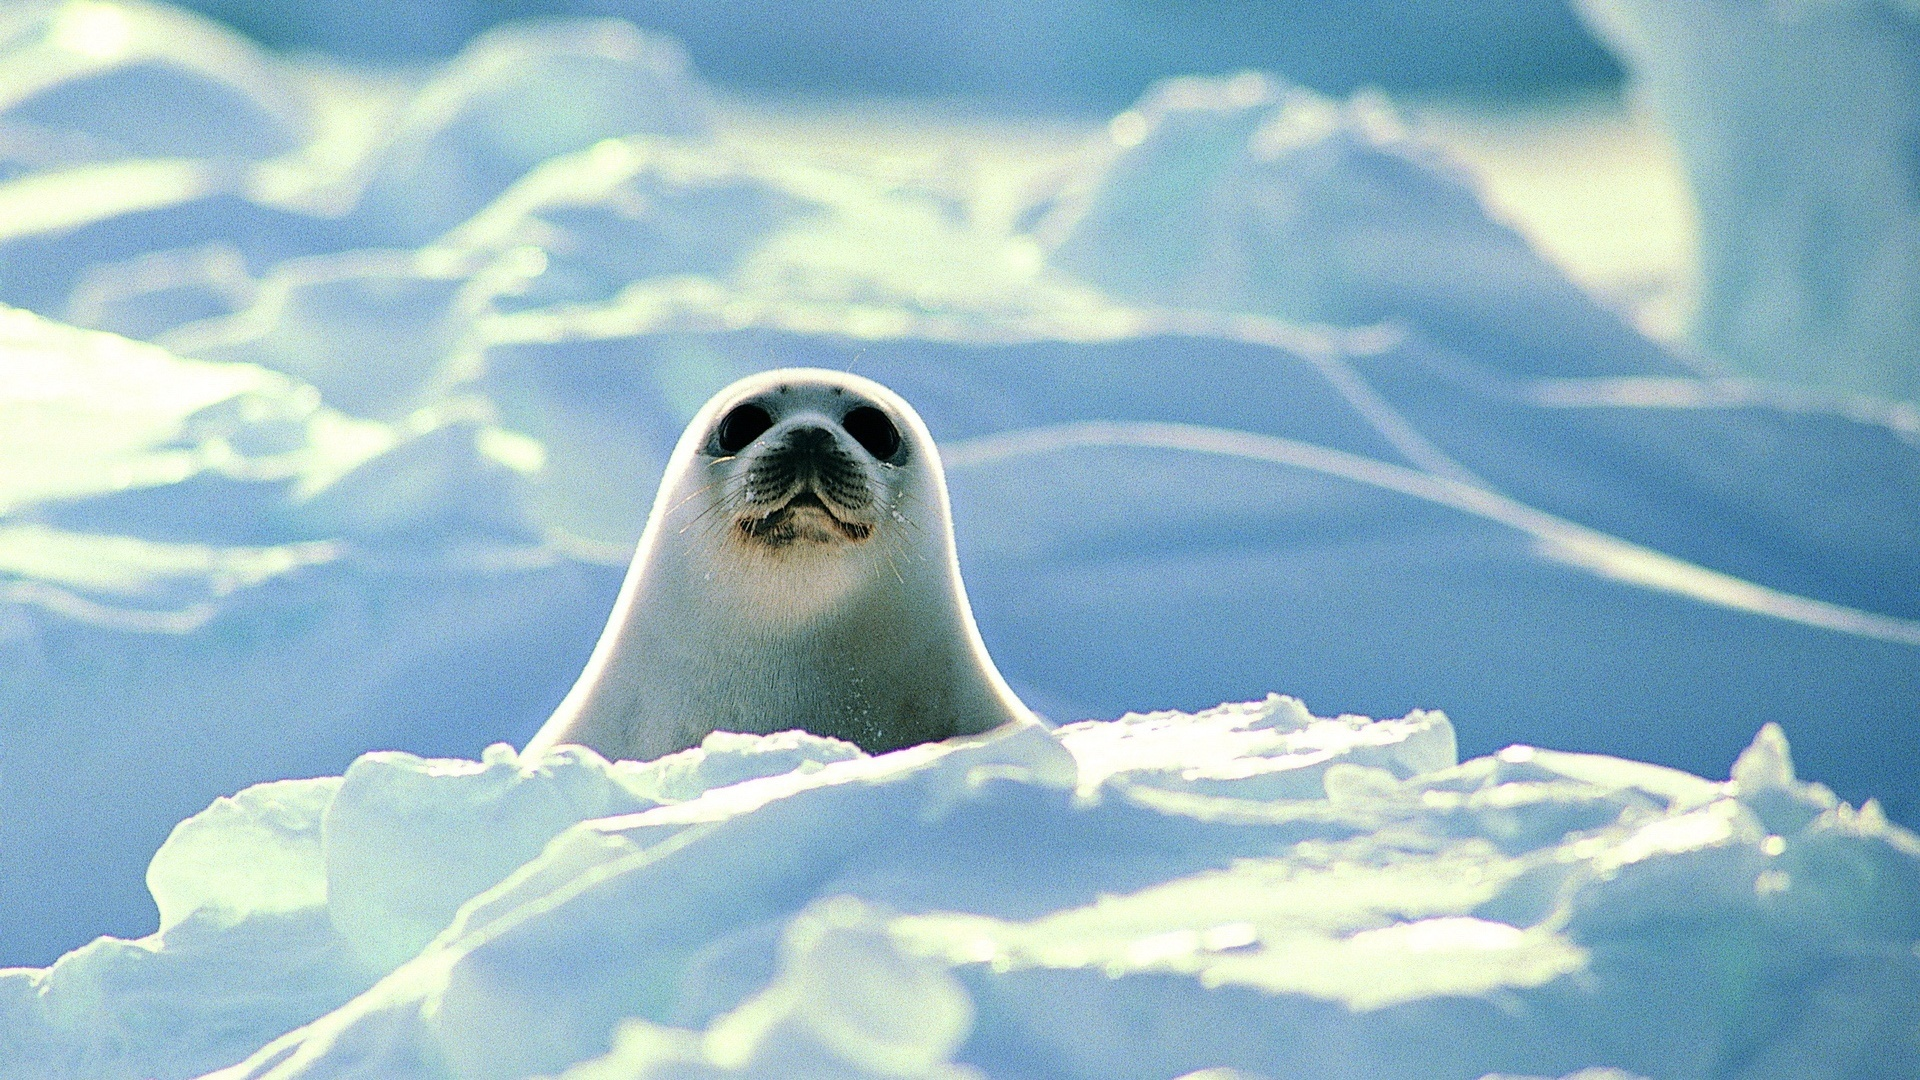 Sfondi bianchi sigillo, neve, freddo, gli animali, foto 1920x1080